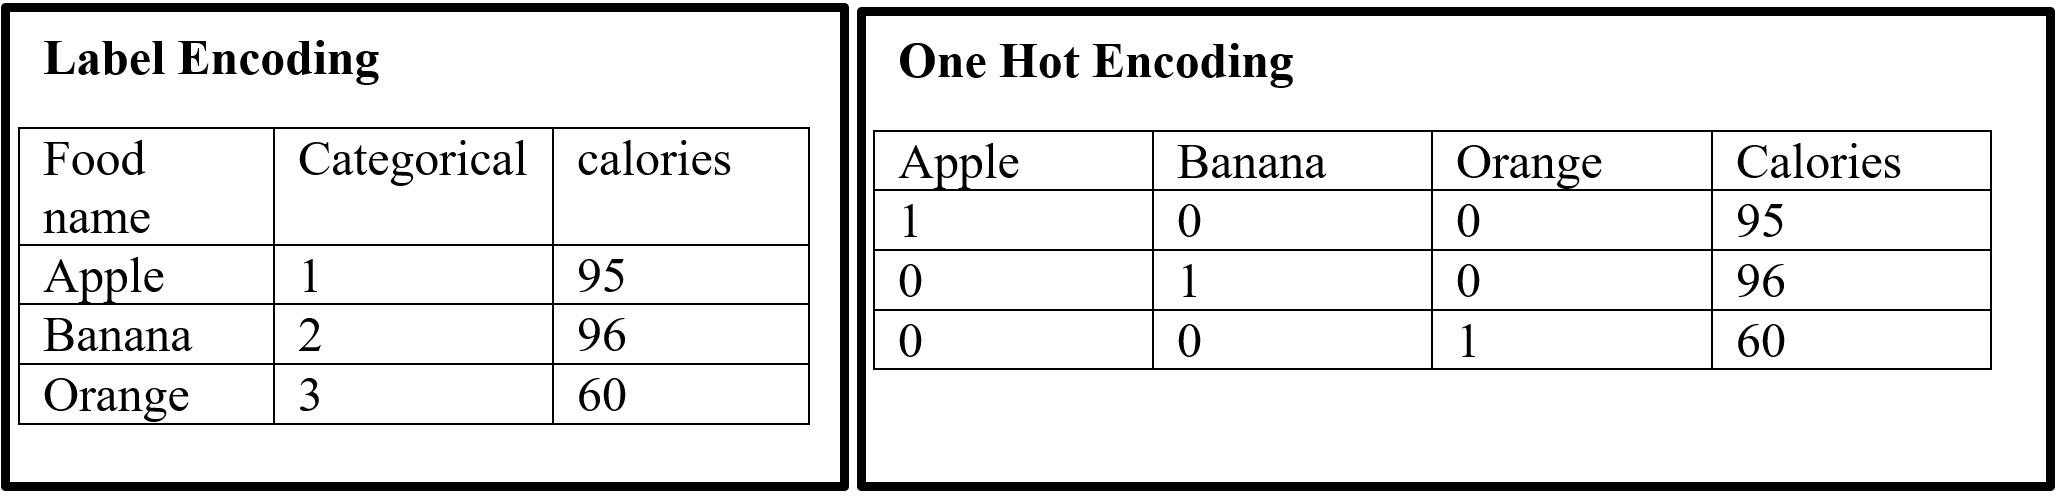 Label Encoding and One-Hot-Encoding